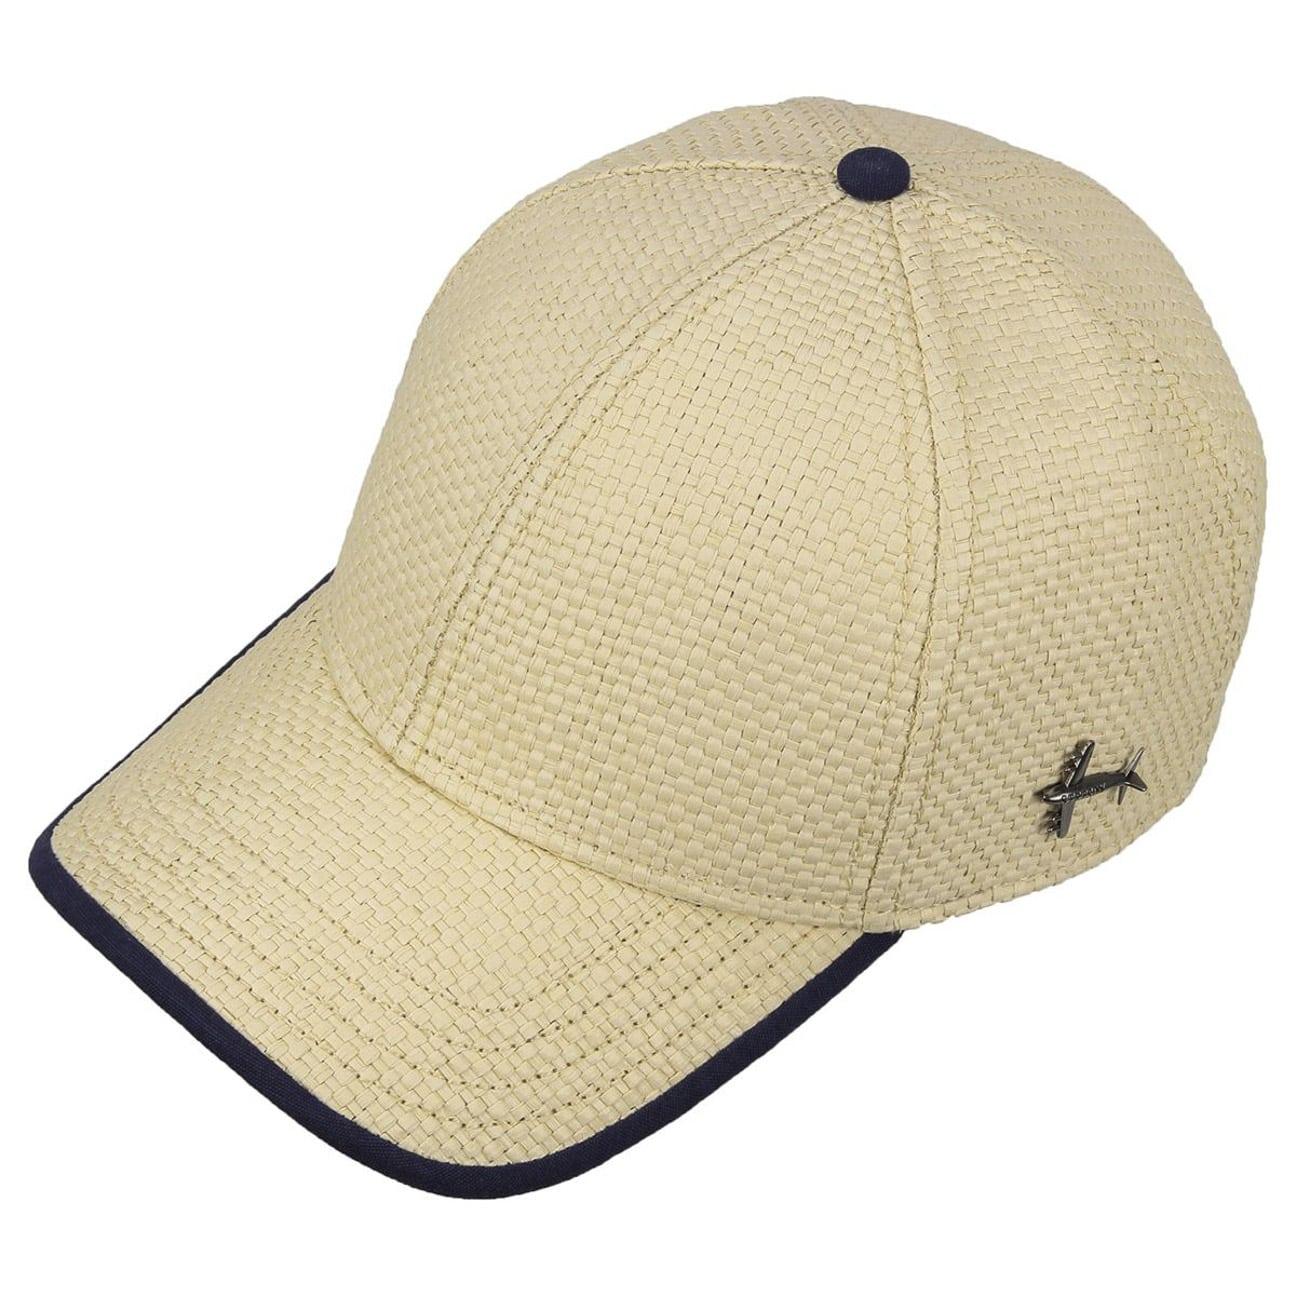 Gorra Plano Toyo Plane Pin by Stetson - Gorras - sombreroshop.es b11aff26106